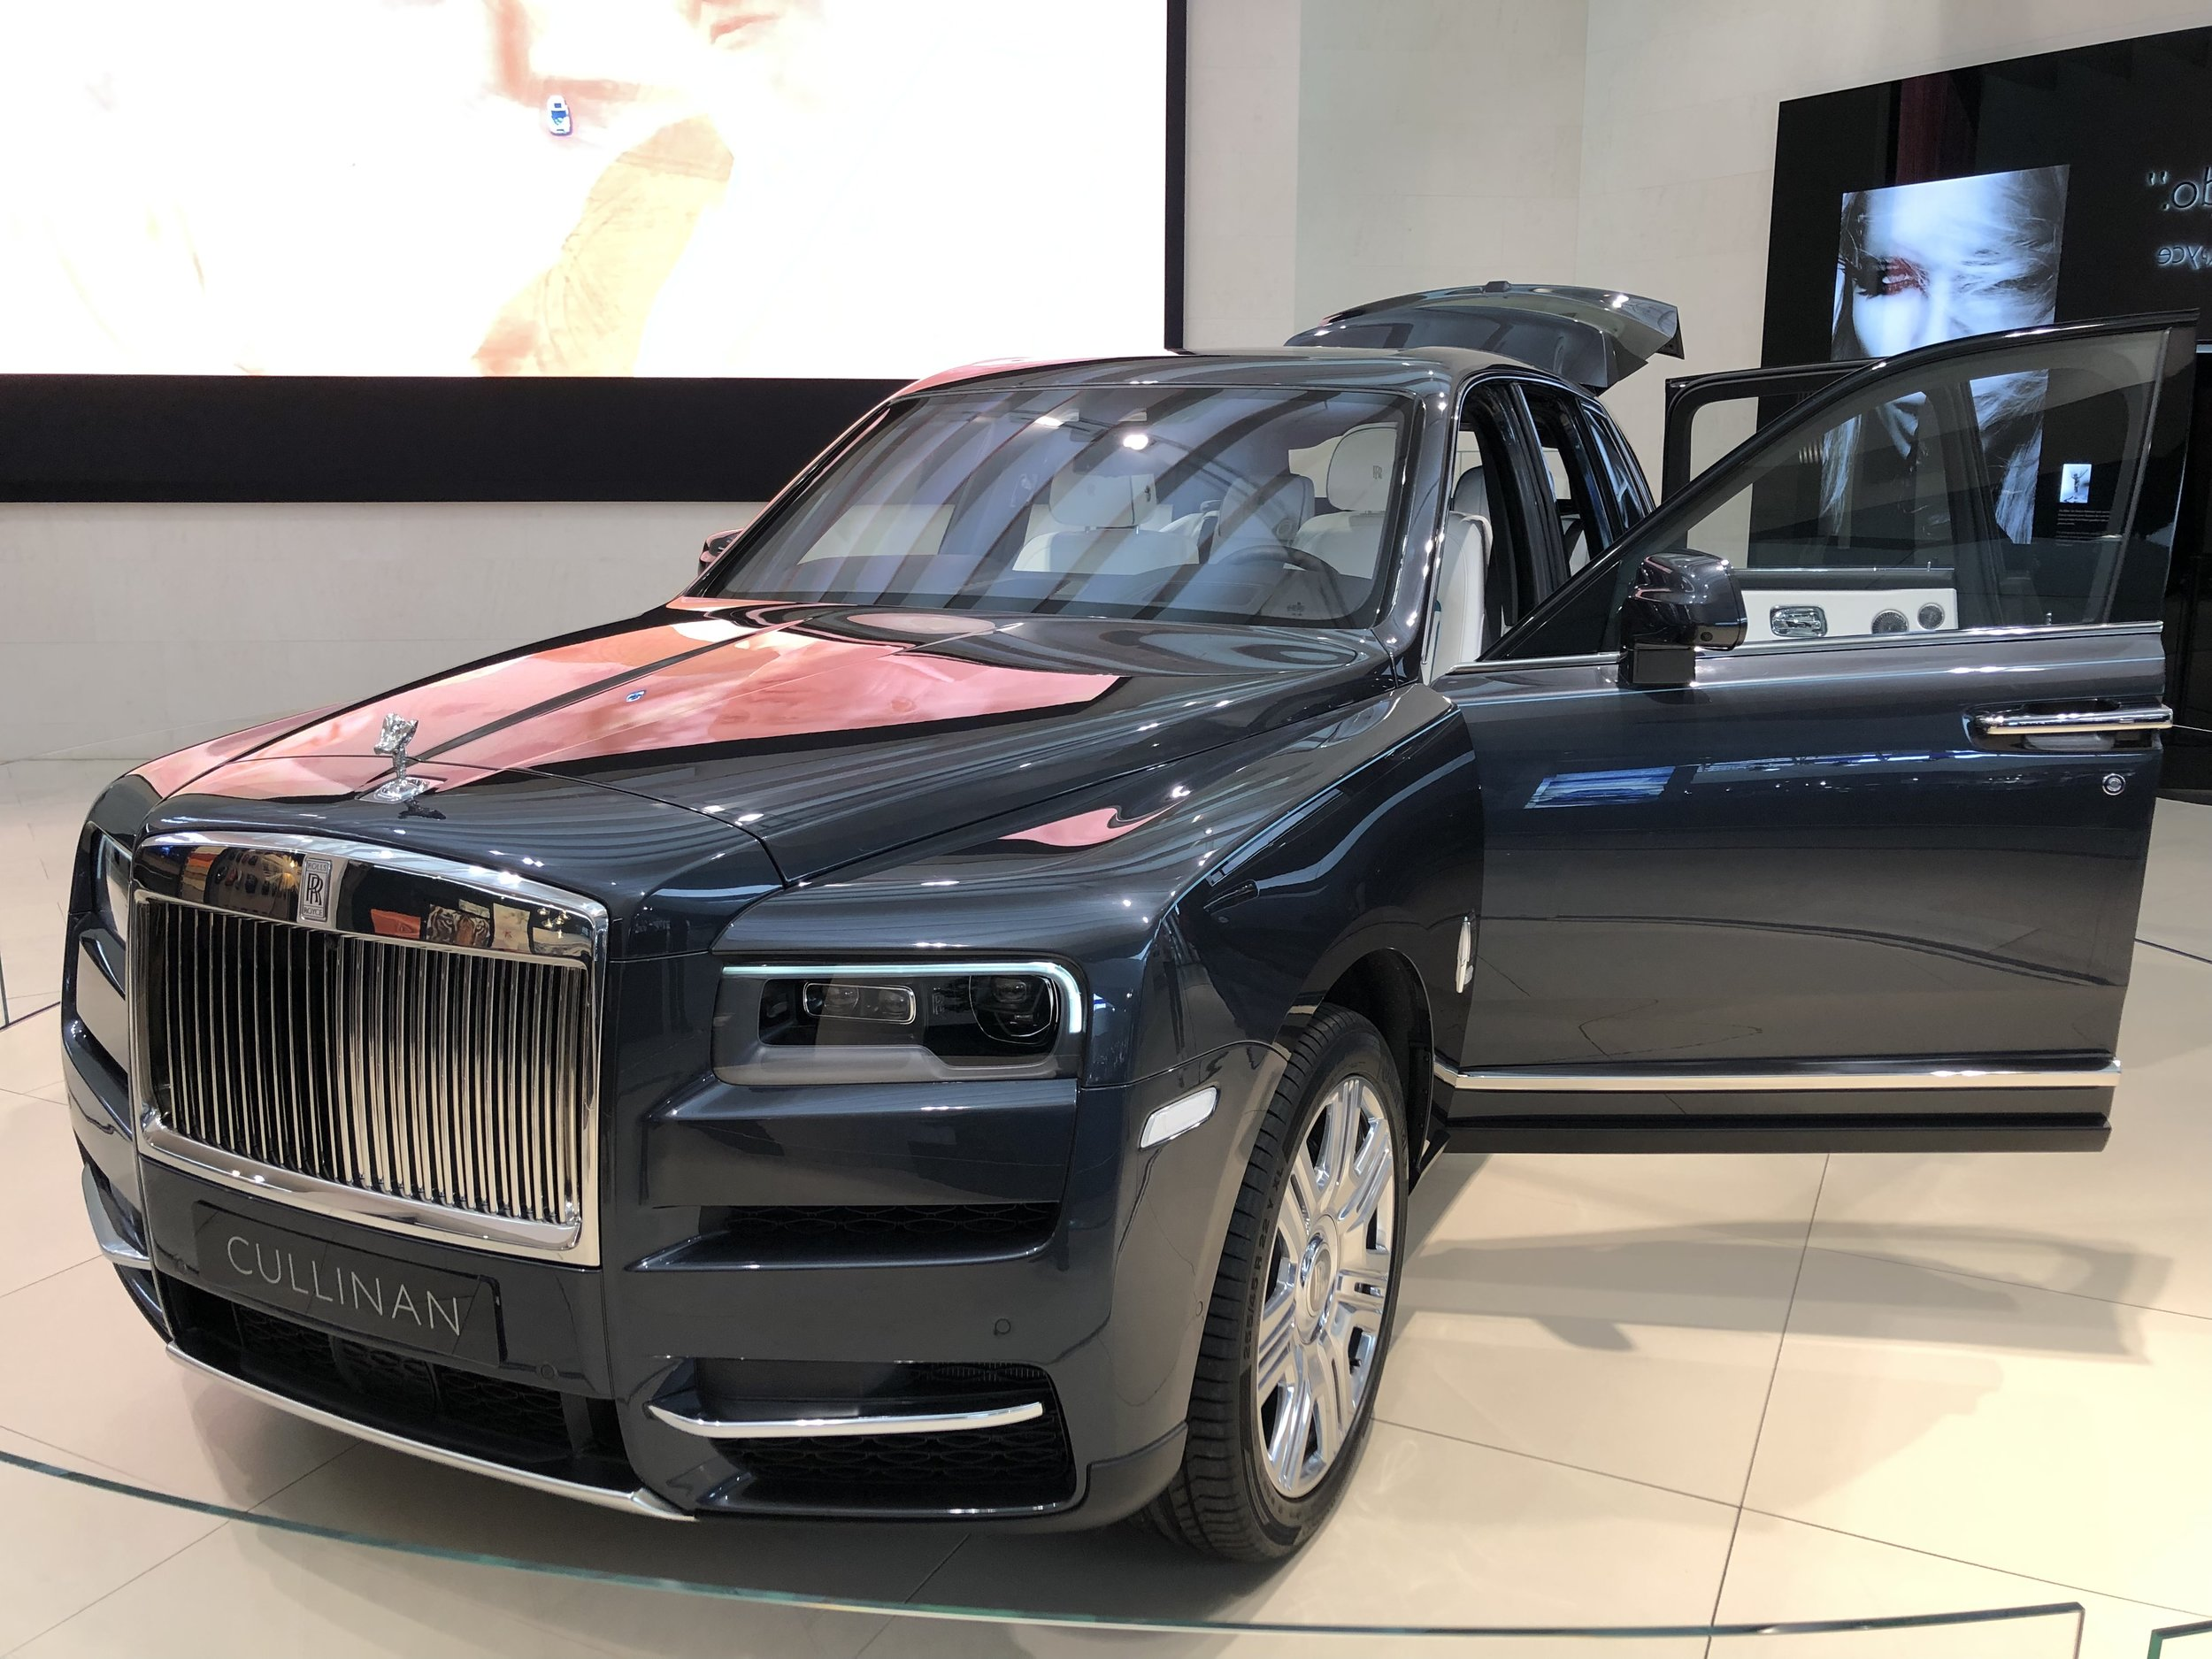 Rolls Royce Cullinan exterior